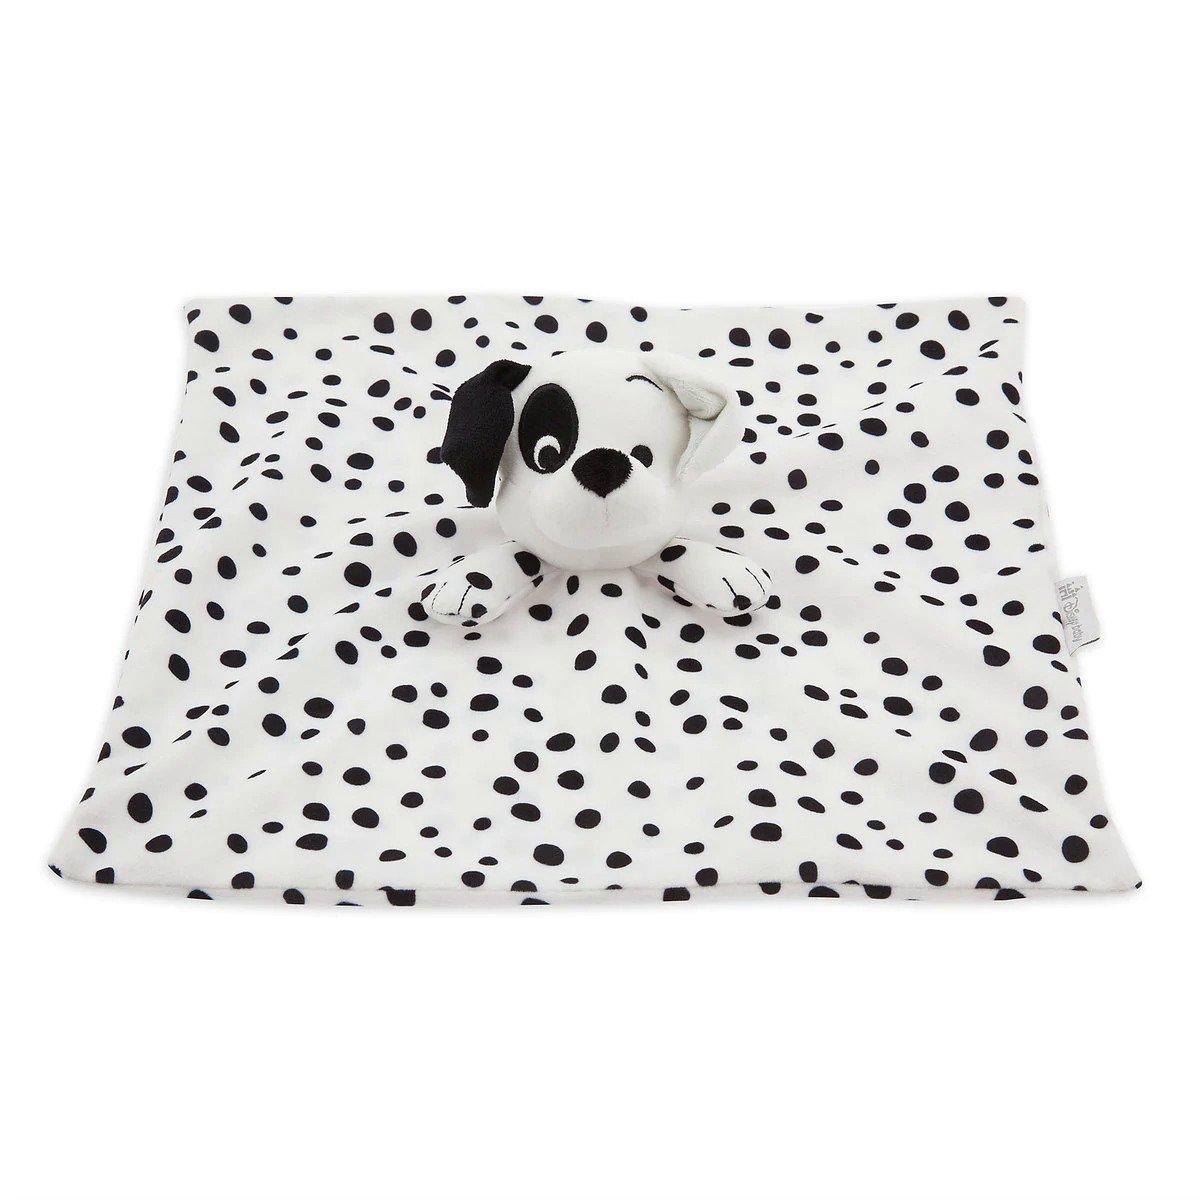 Disney Store Plush Toy Blankie for Baby 101 Dalmatians 2018